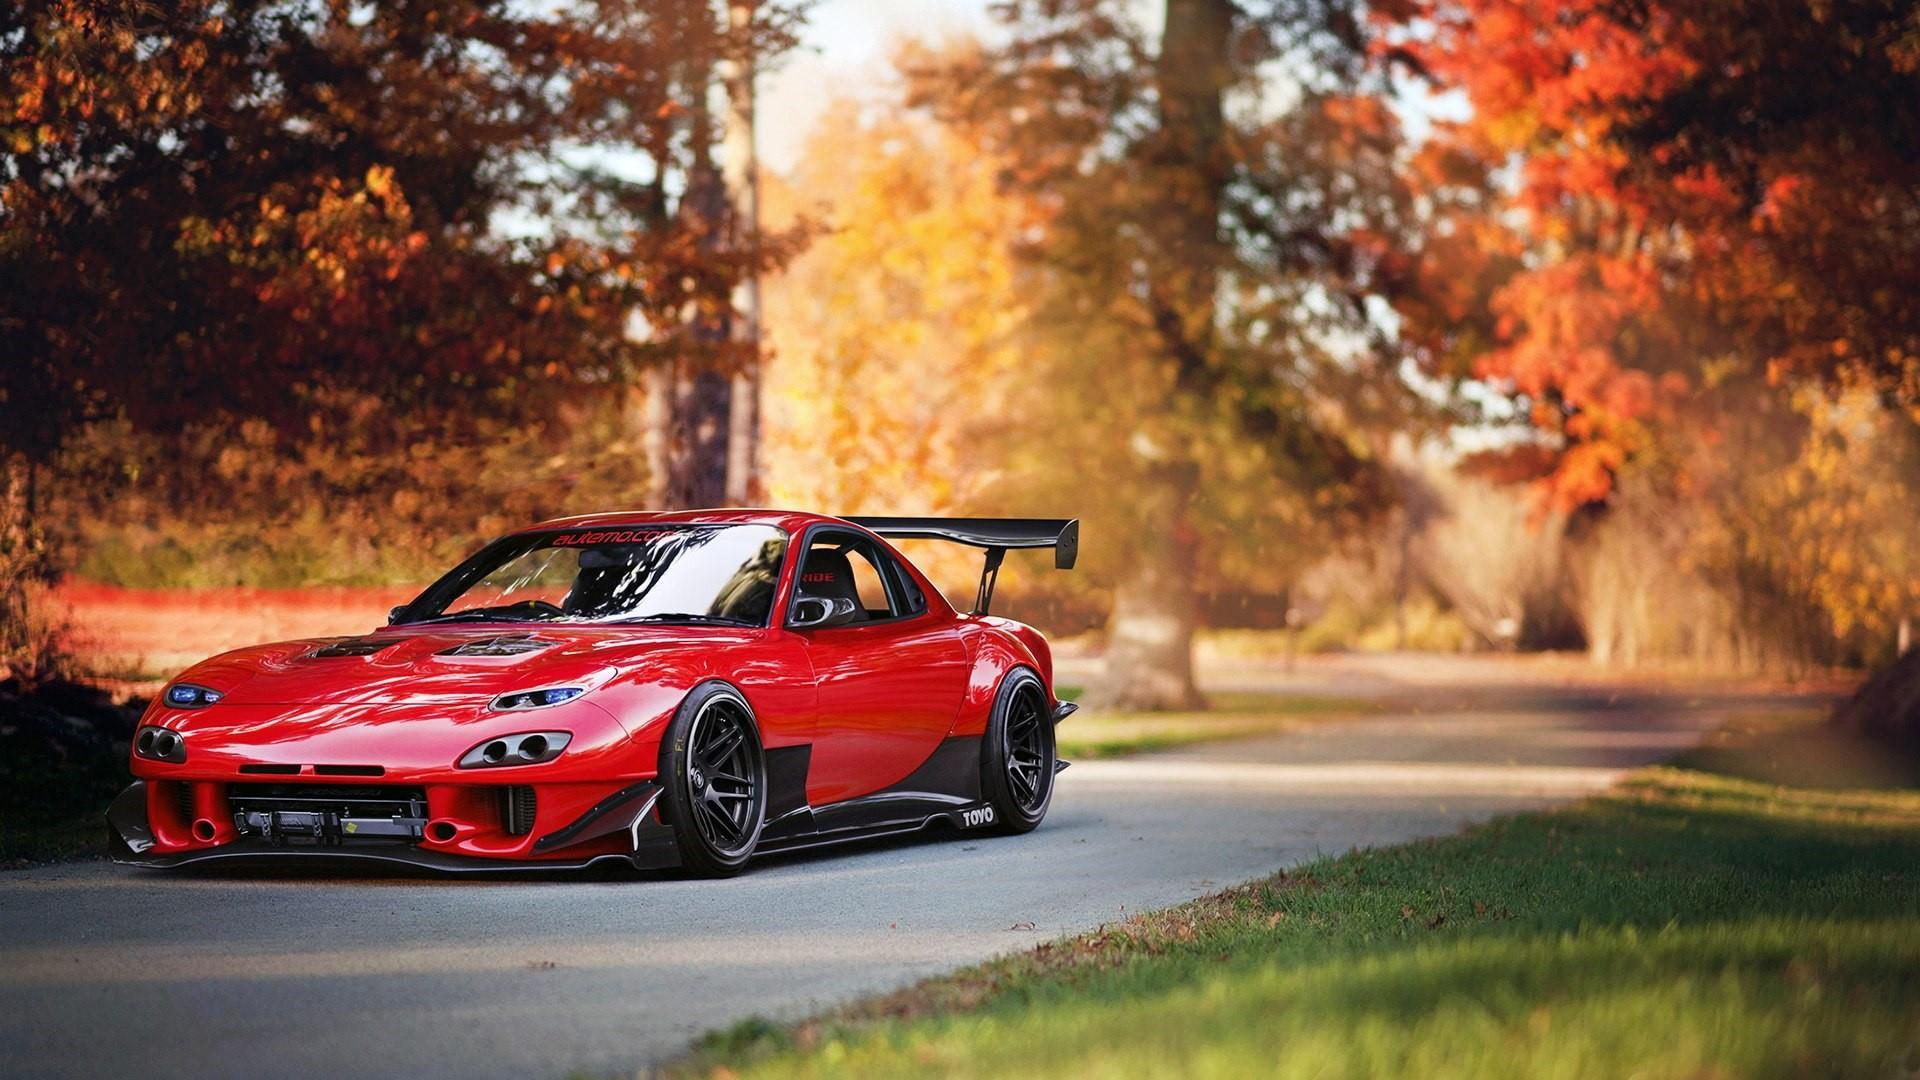 Car Mazda Rx 7 1554602 Hd Wallpaper Backgrounds Download